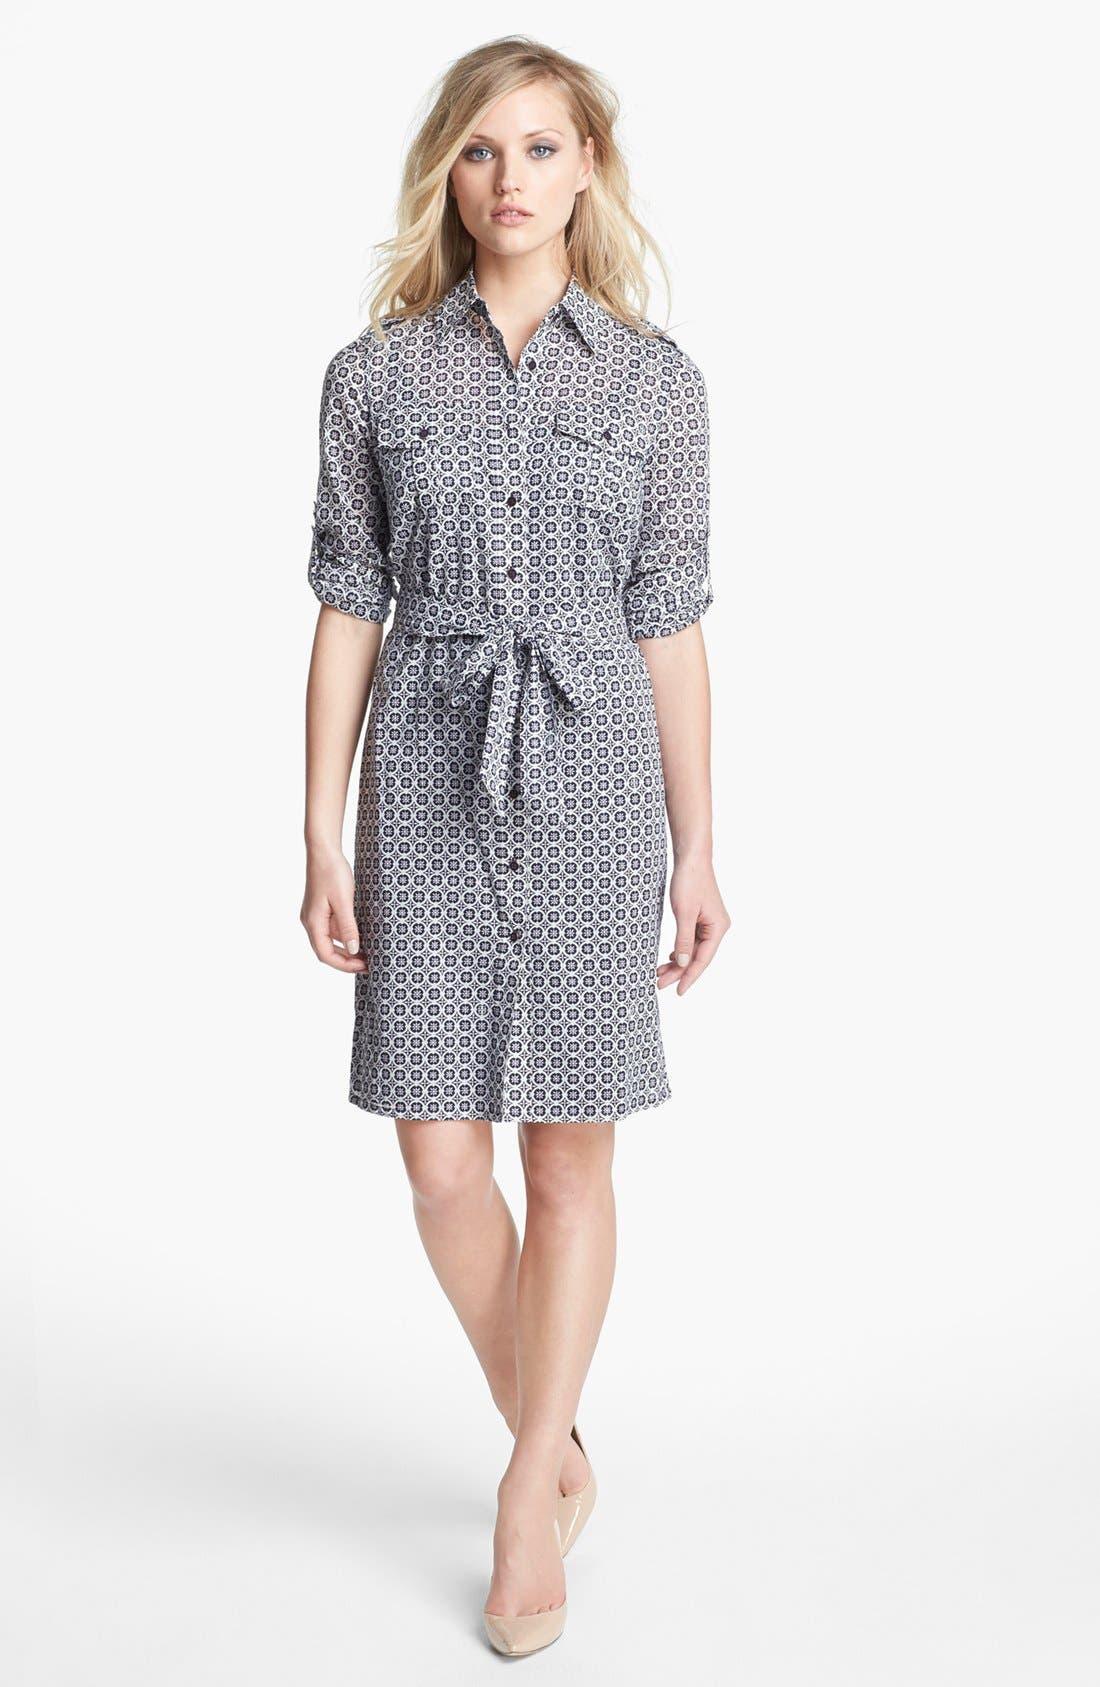 Main Image - Tory Burch 'Brigitte' Cotton Shirtdress